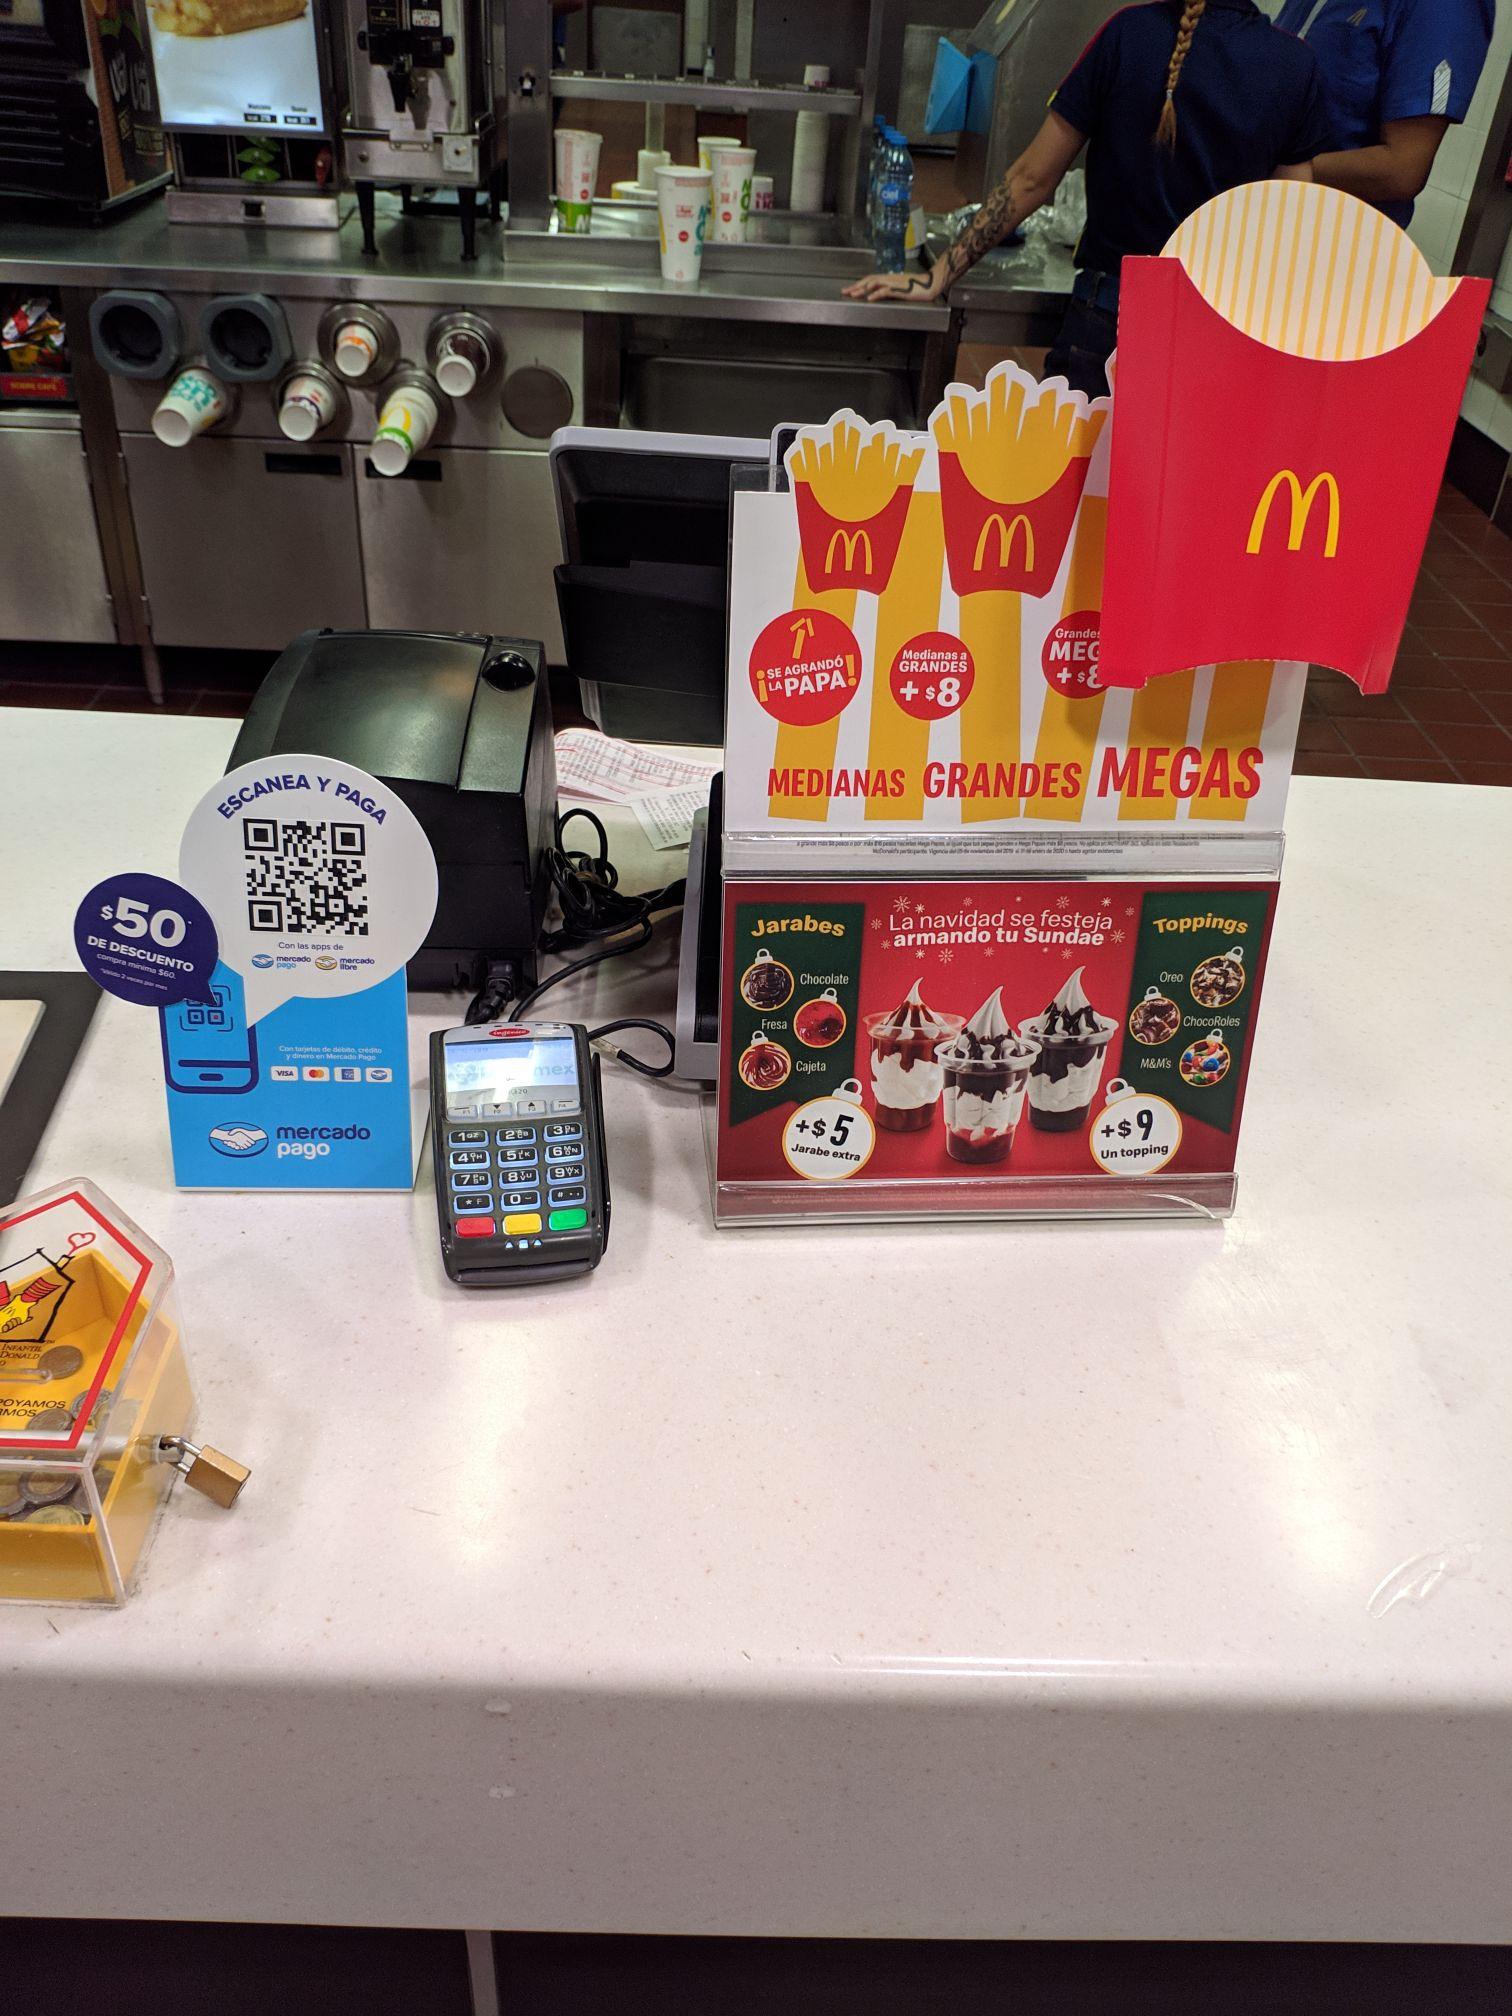 $50 de descuento pagado con mercado pago en McDonald's